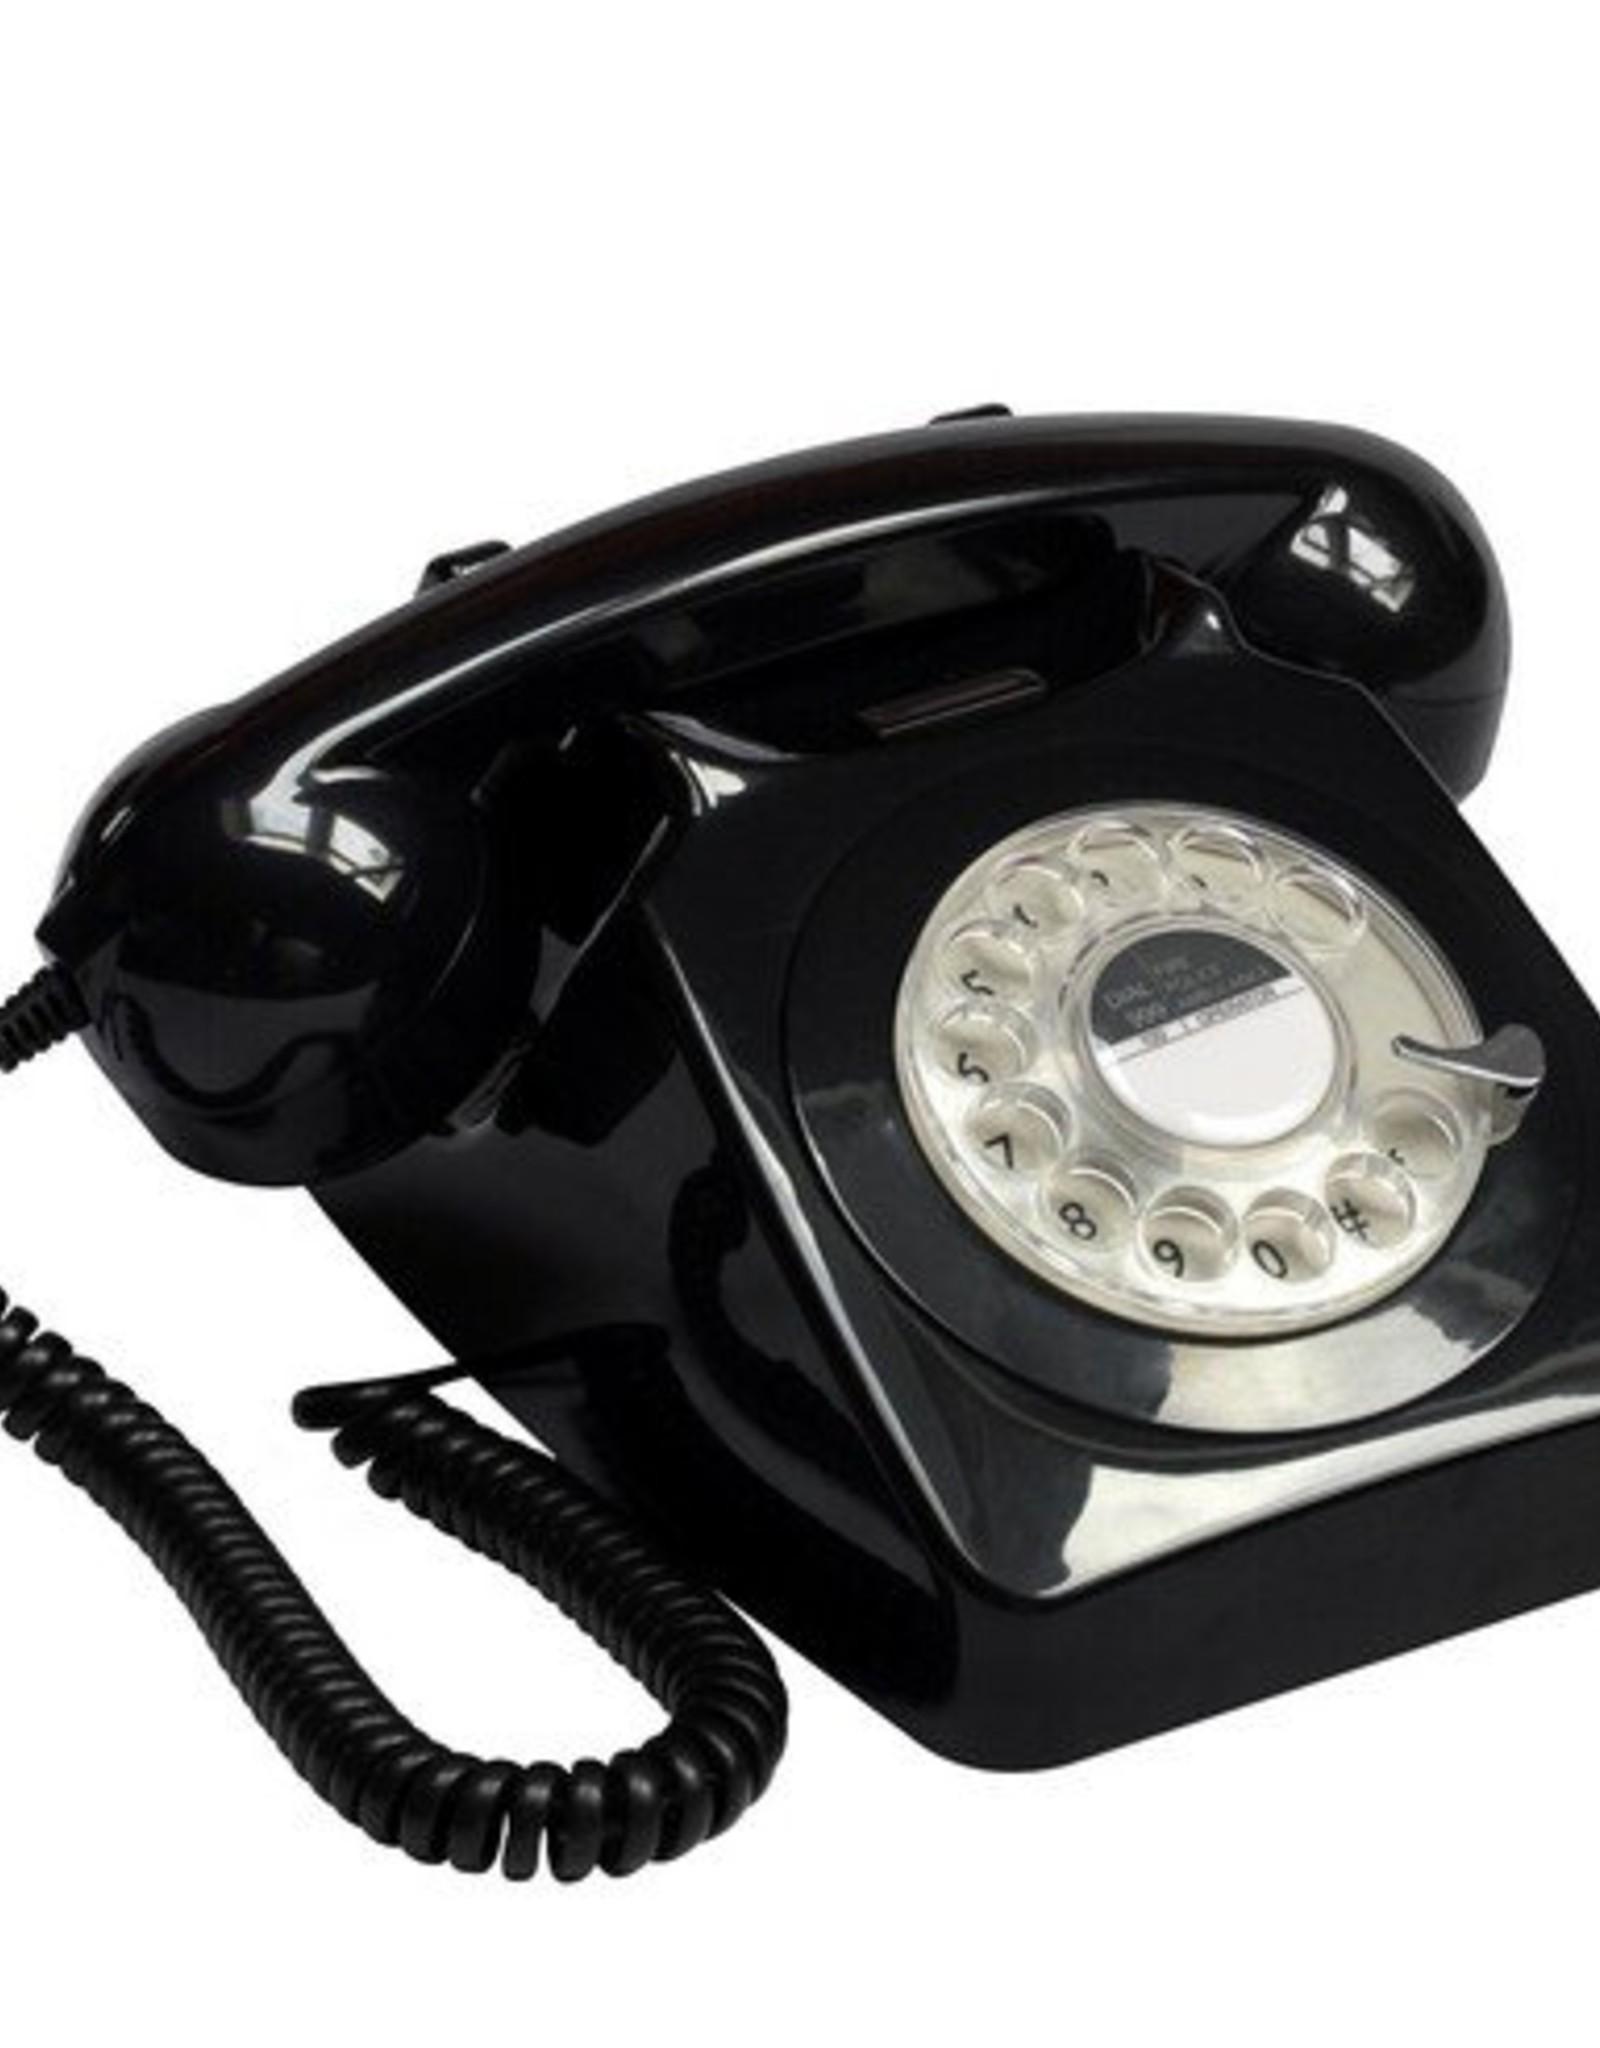 GPO GPO Klassieke telefoon 746 ROTARY - zwart